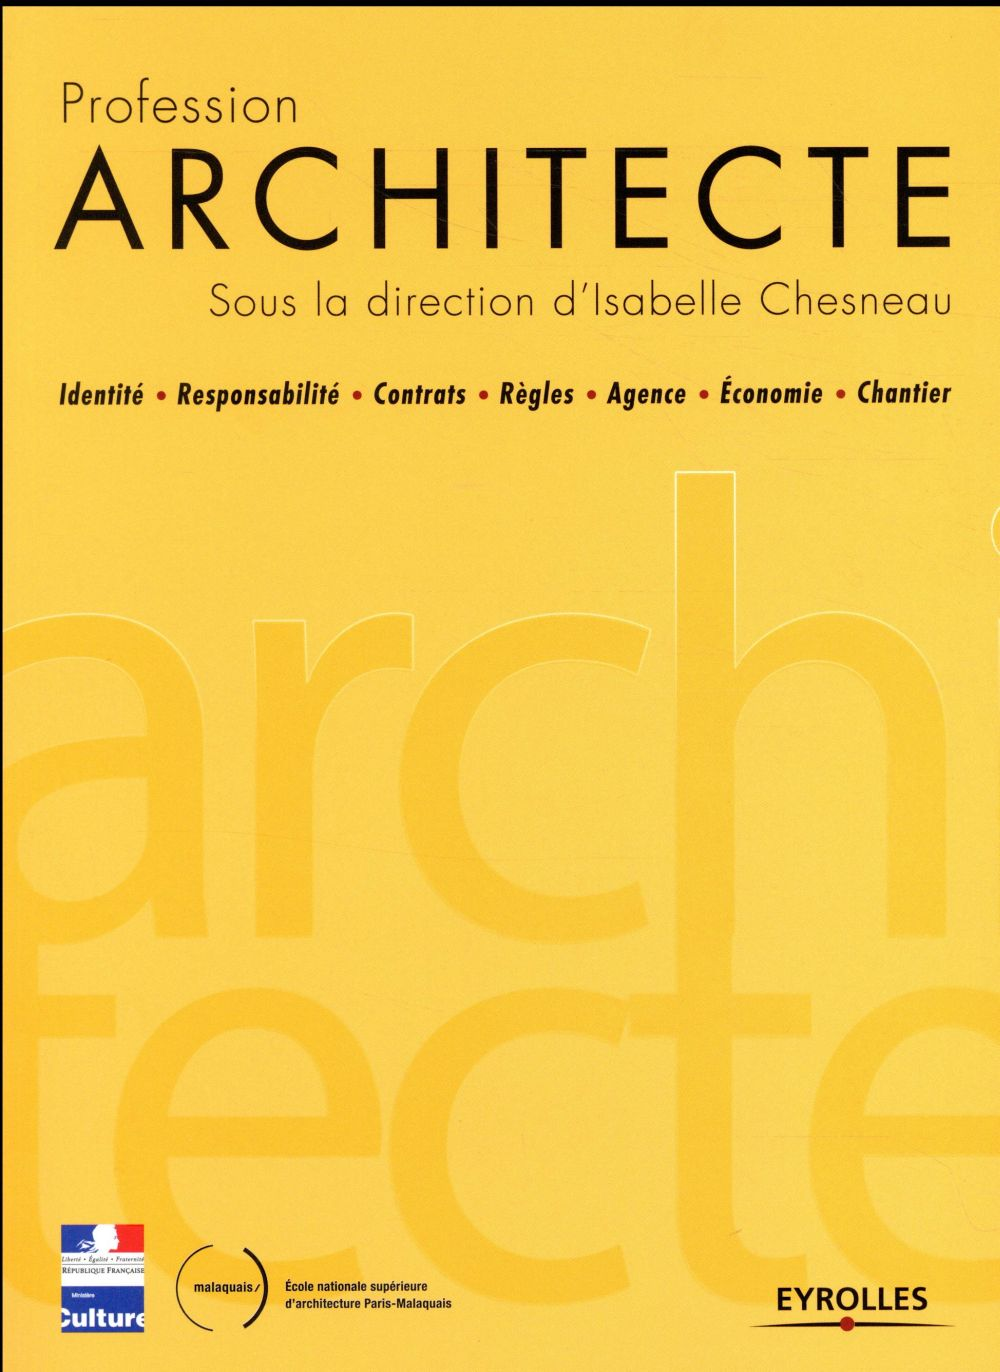 profession architecte